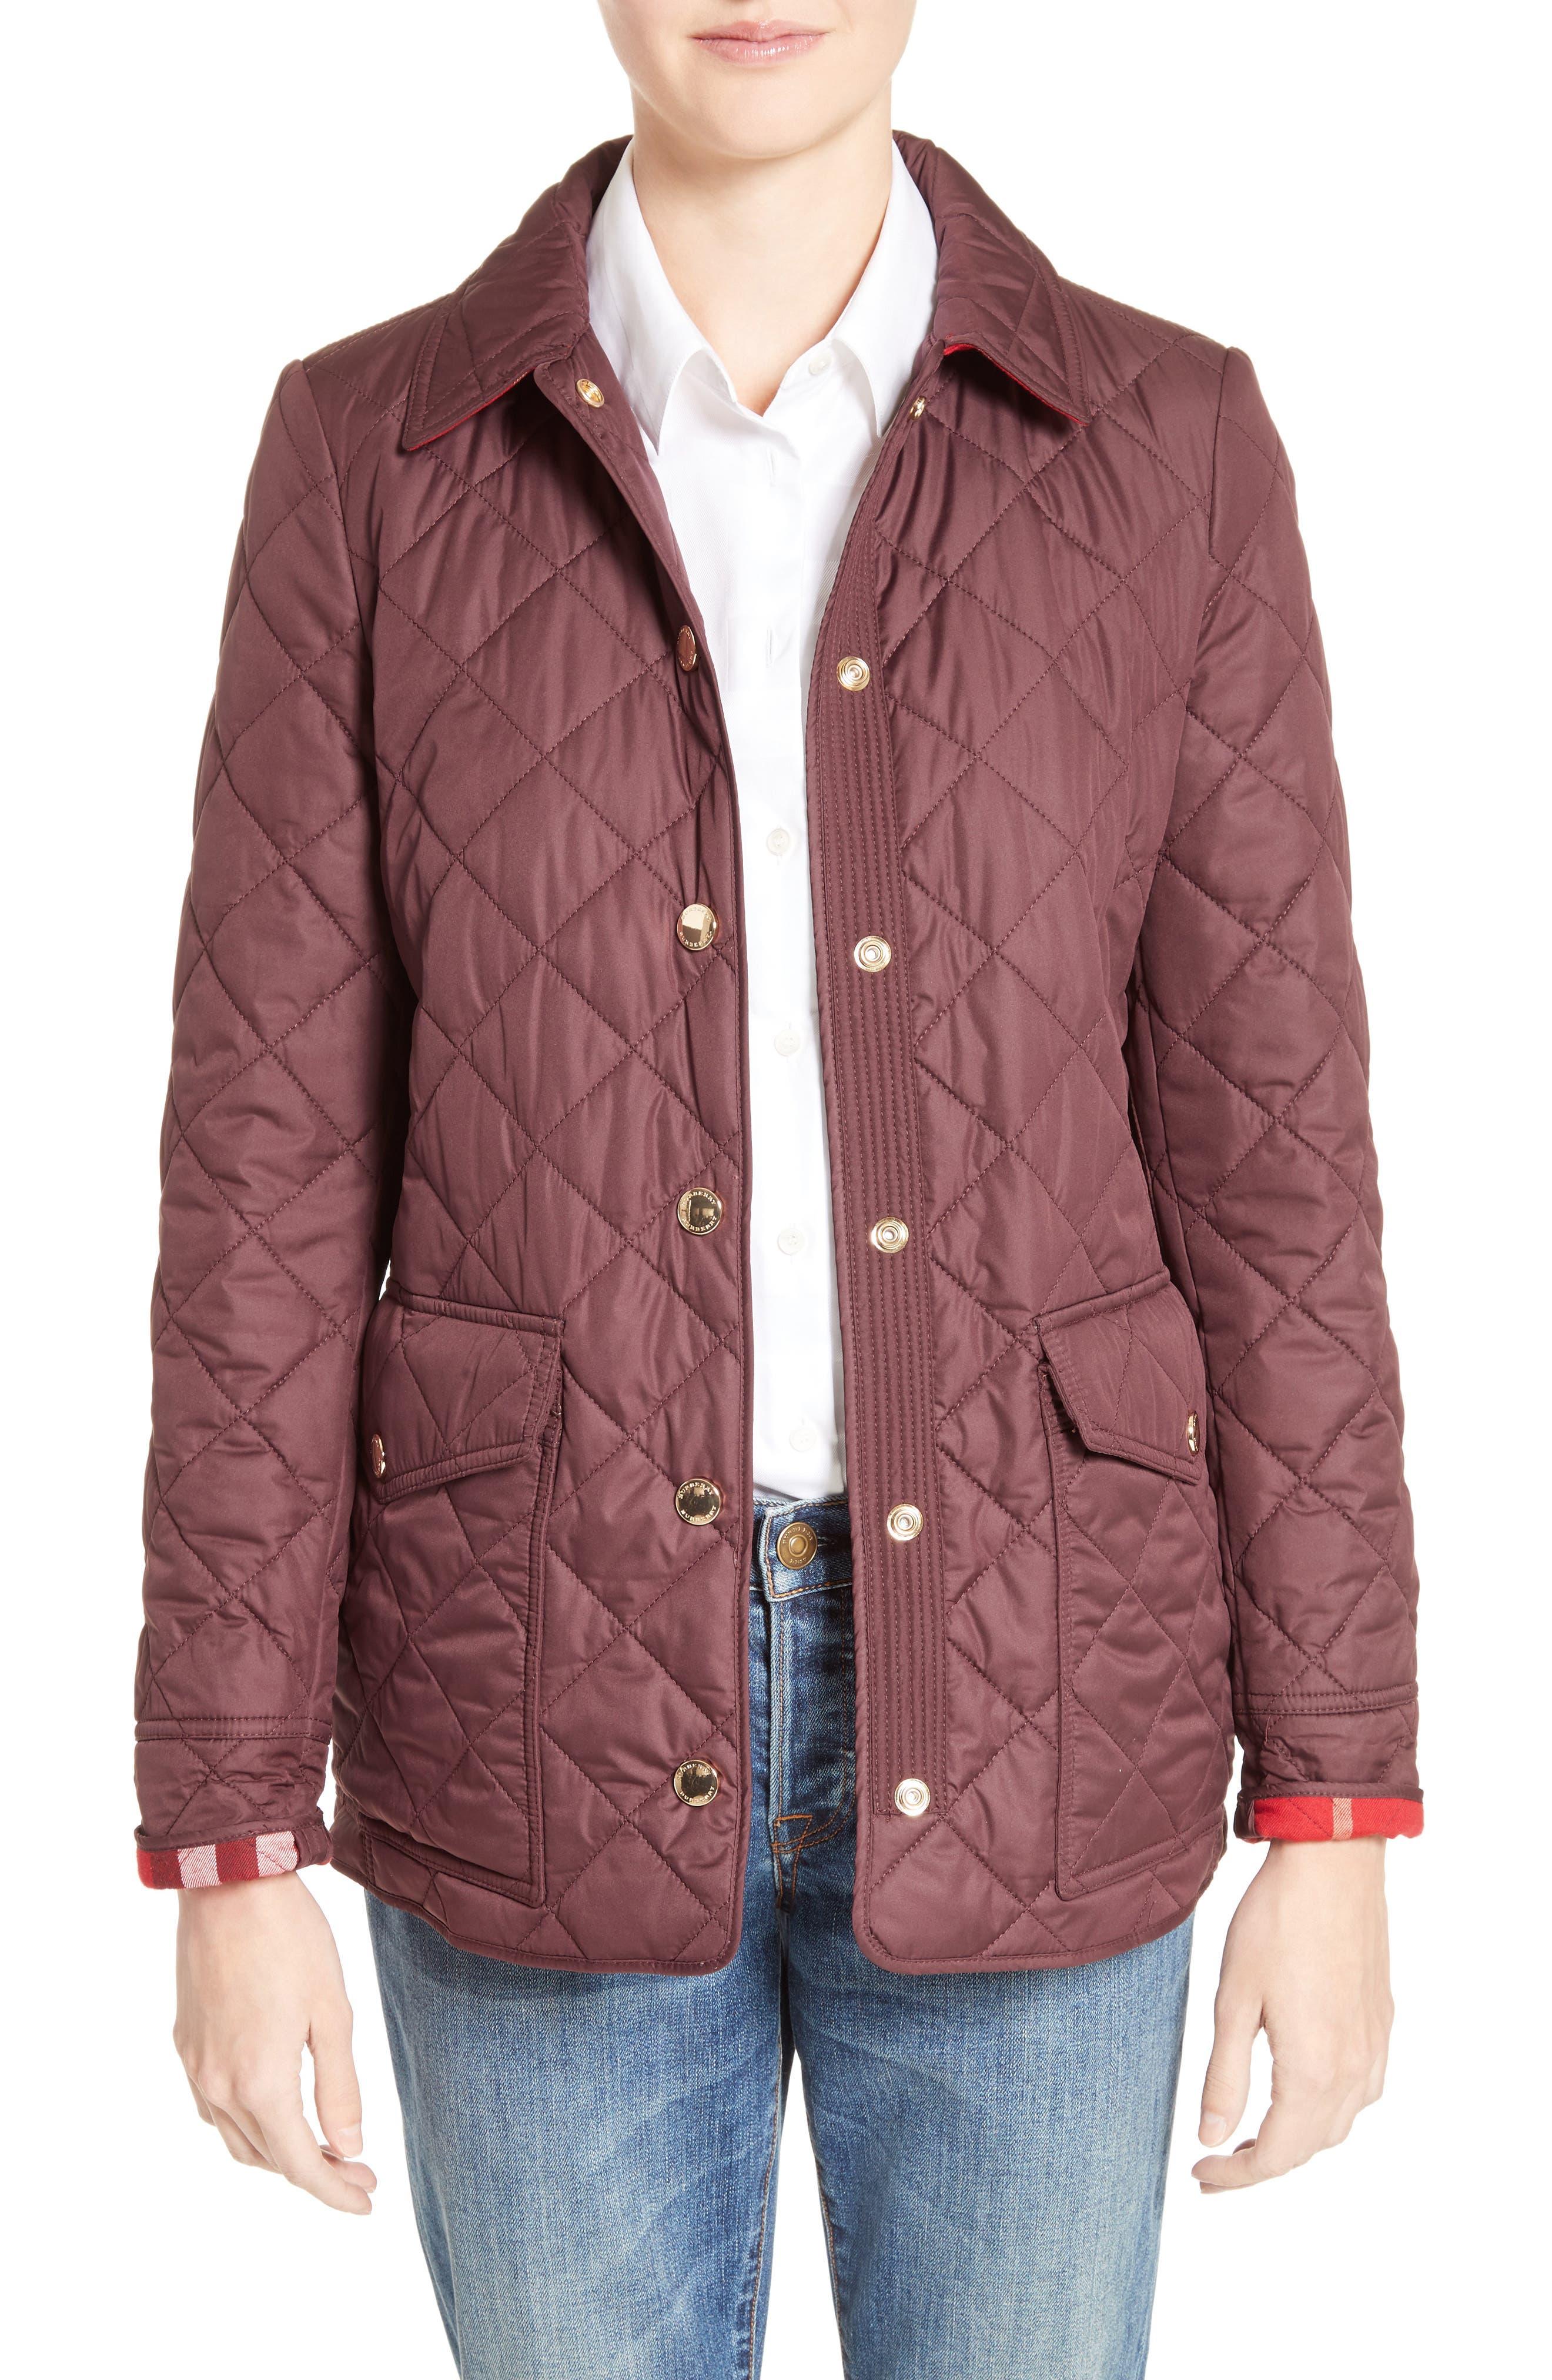 Westbridge Quilted Jacket,                             Main thumbnail 1, color,                             Burgundy